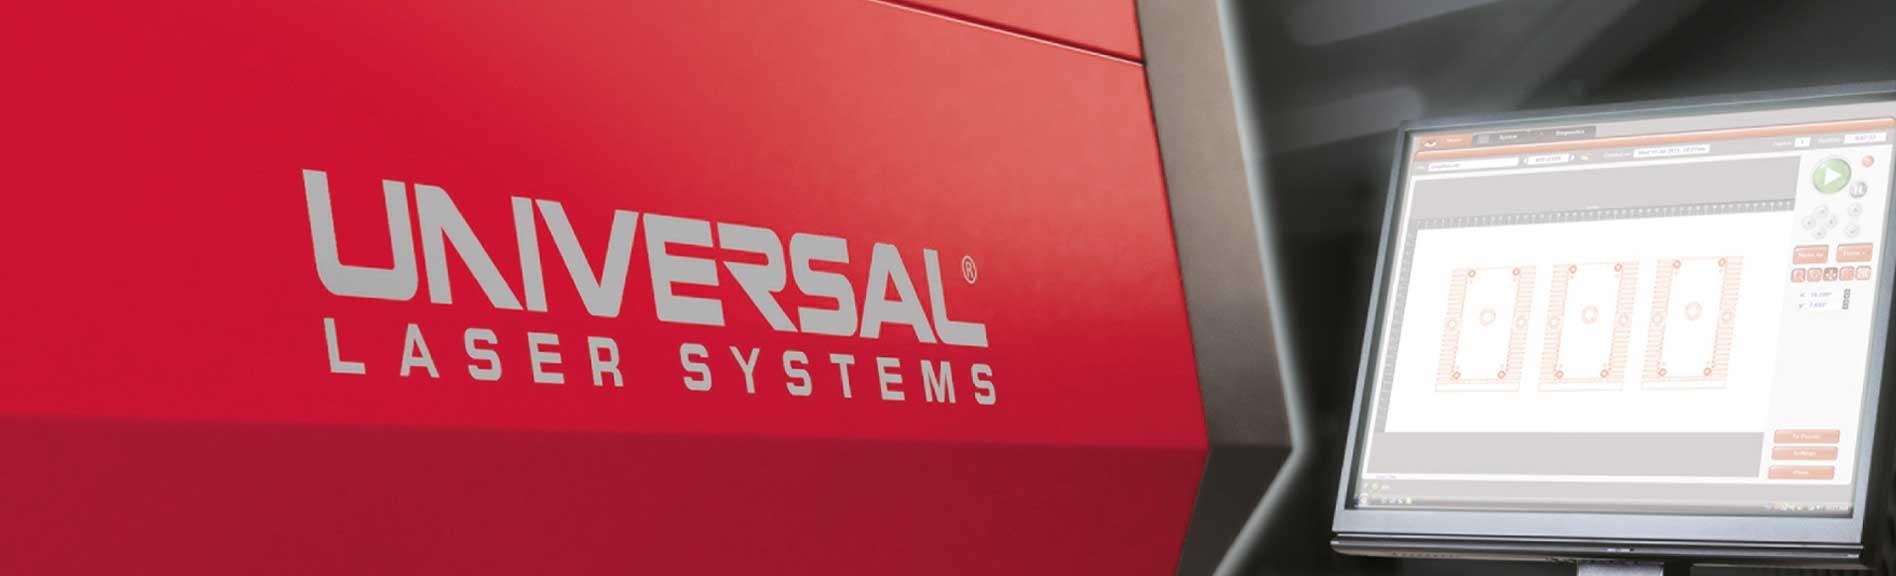 Unuversal Laser Systems